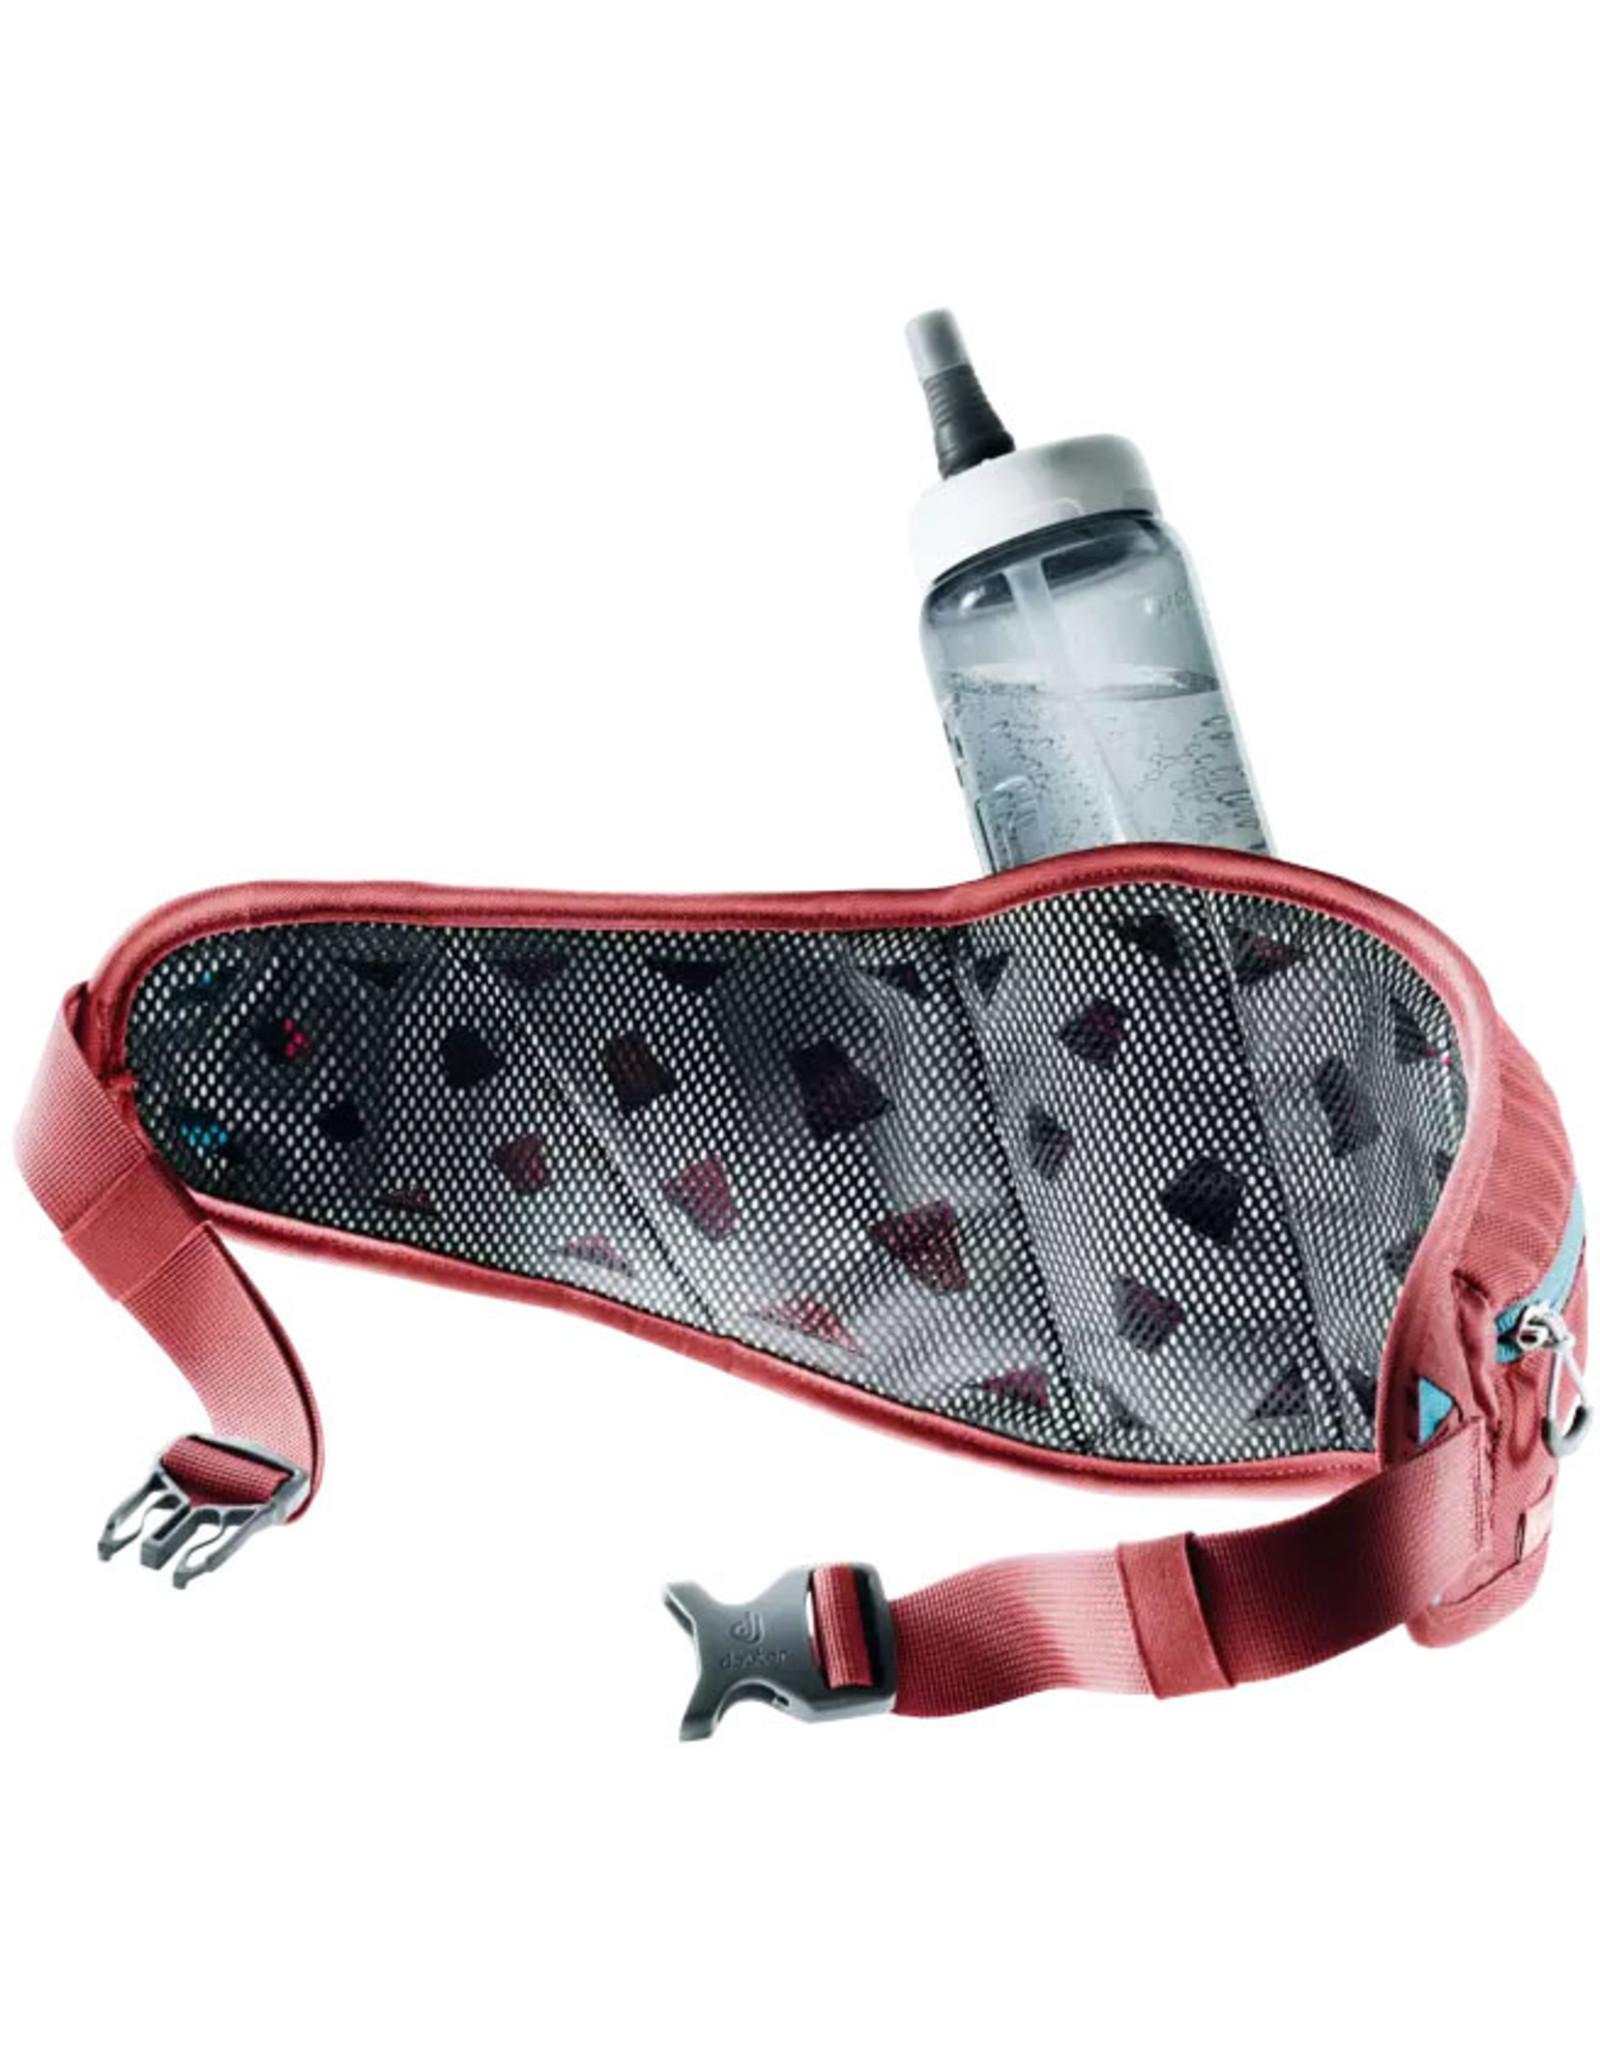 Deuter Deuter Packs Pulse 2 Hip Bag